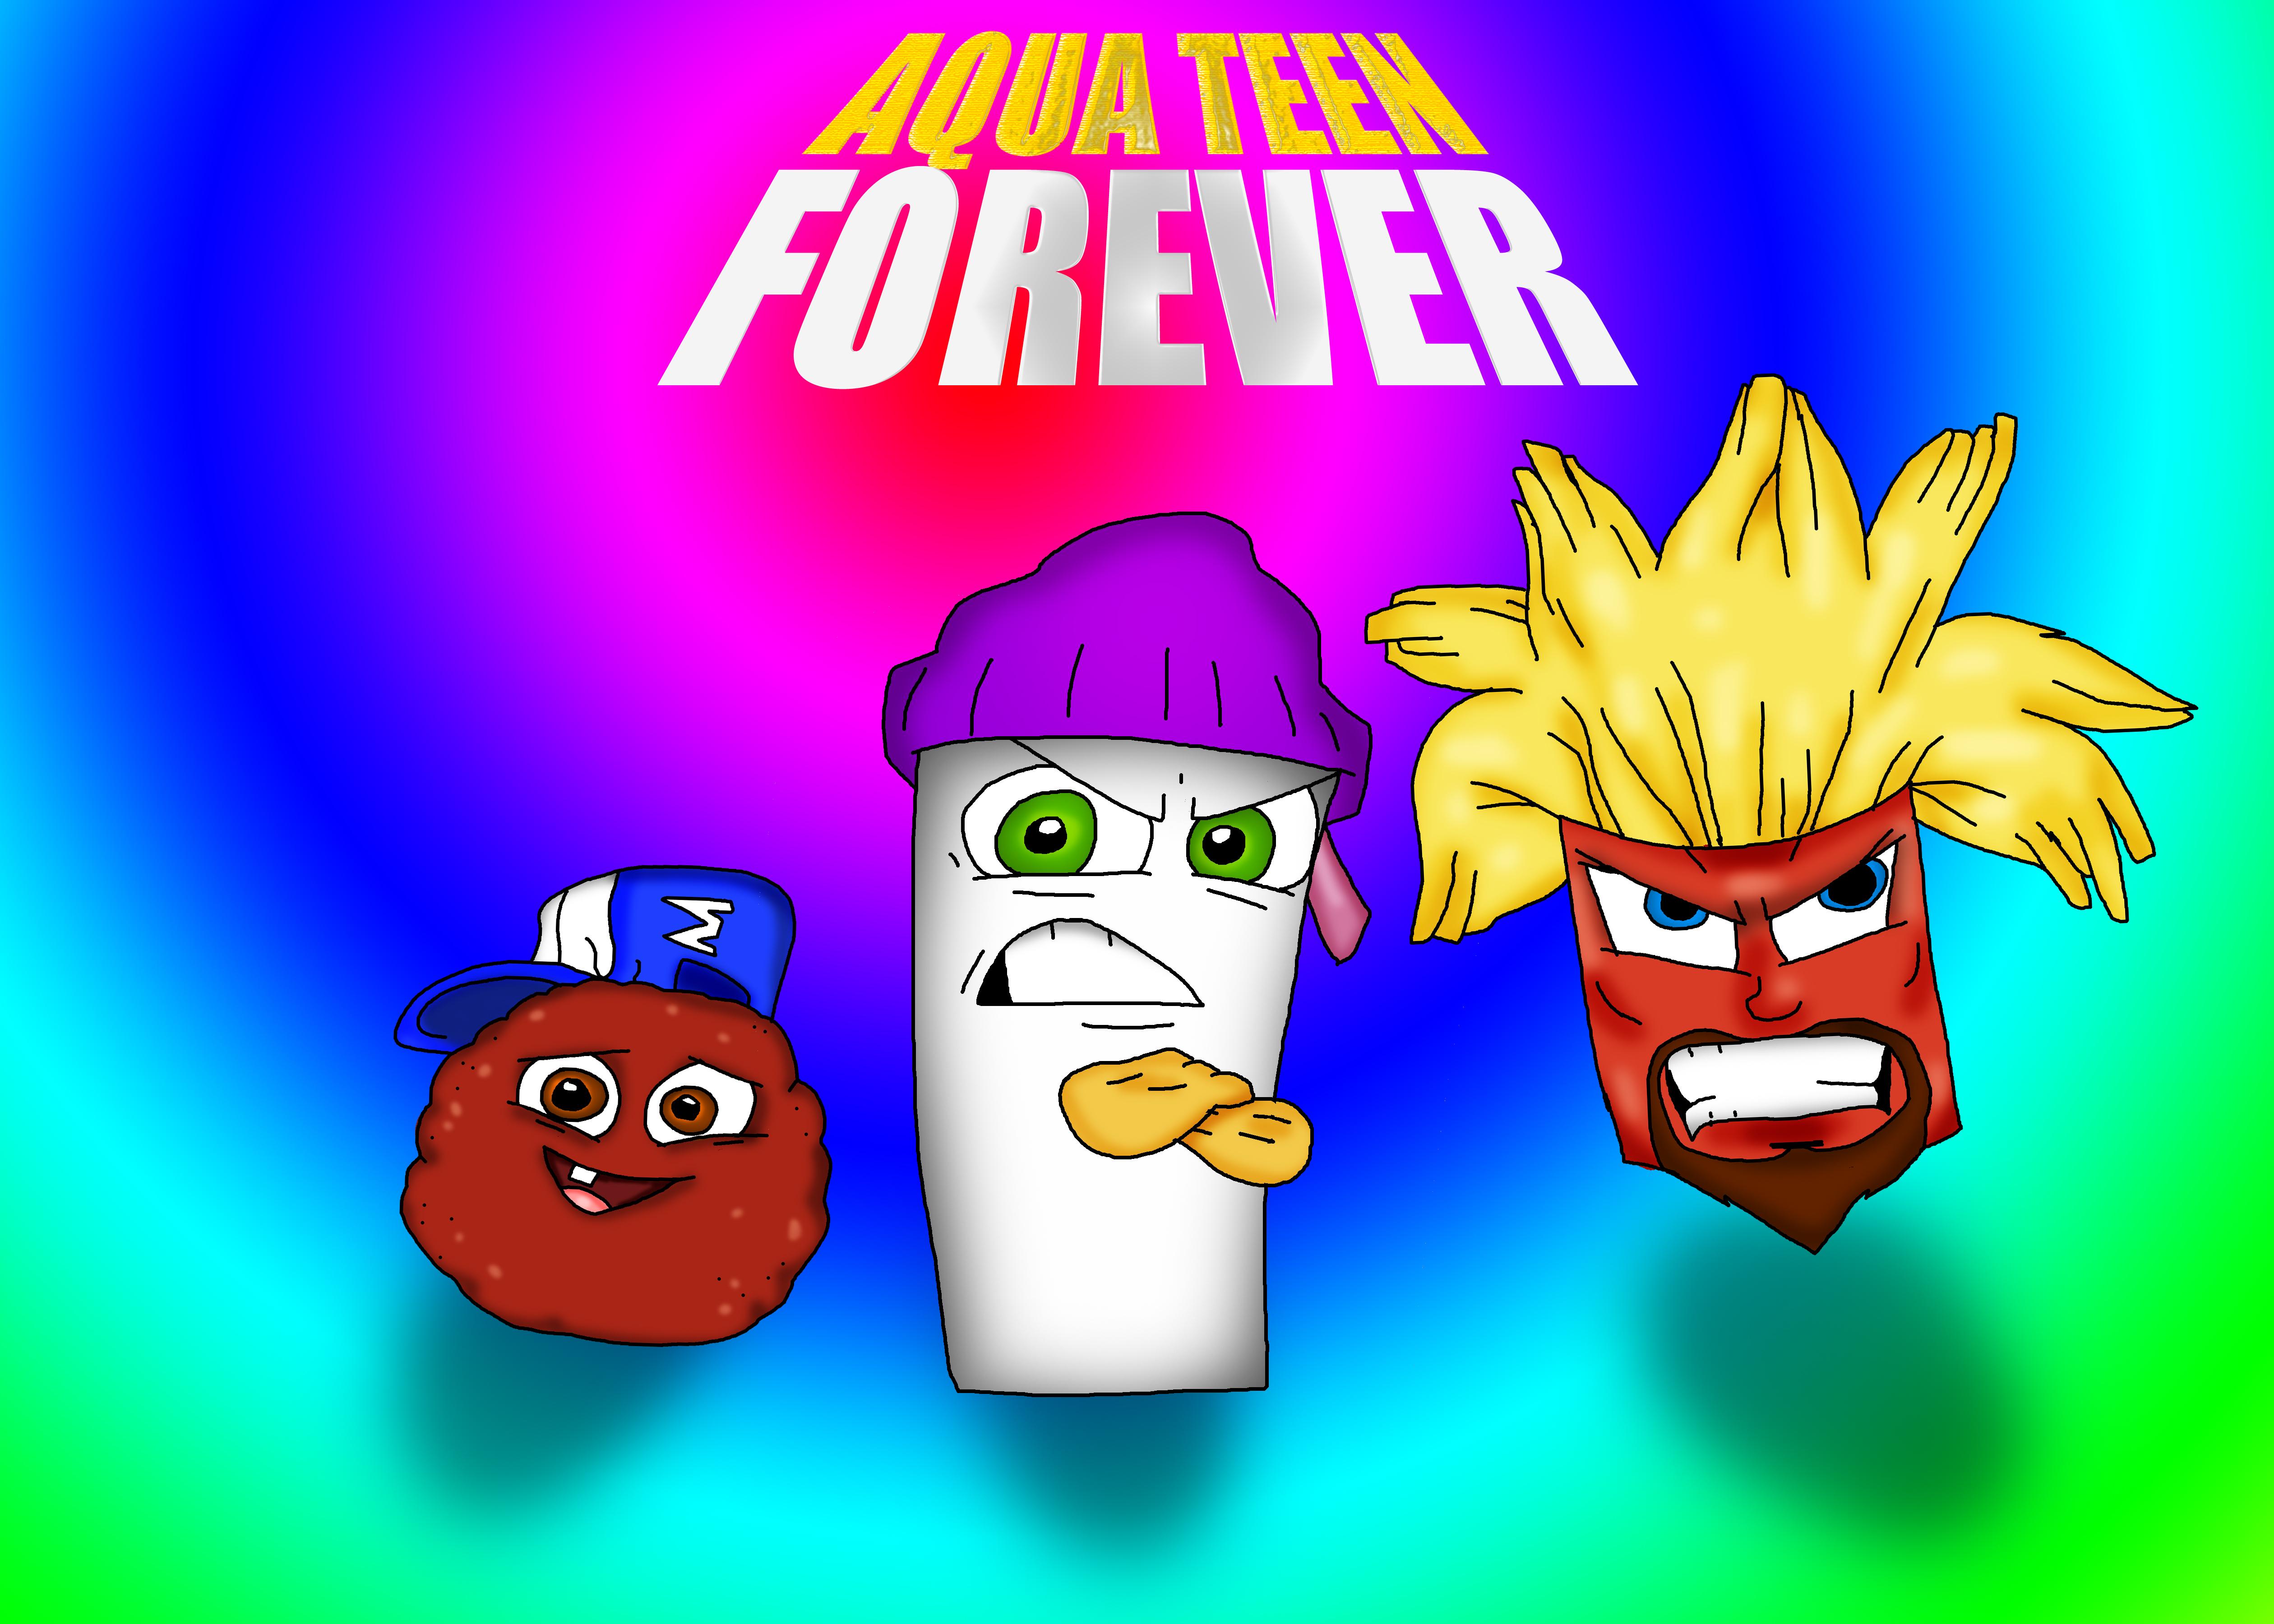 Aqua Teen Hunger Force PS2 Games PlayStation